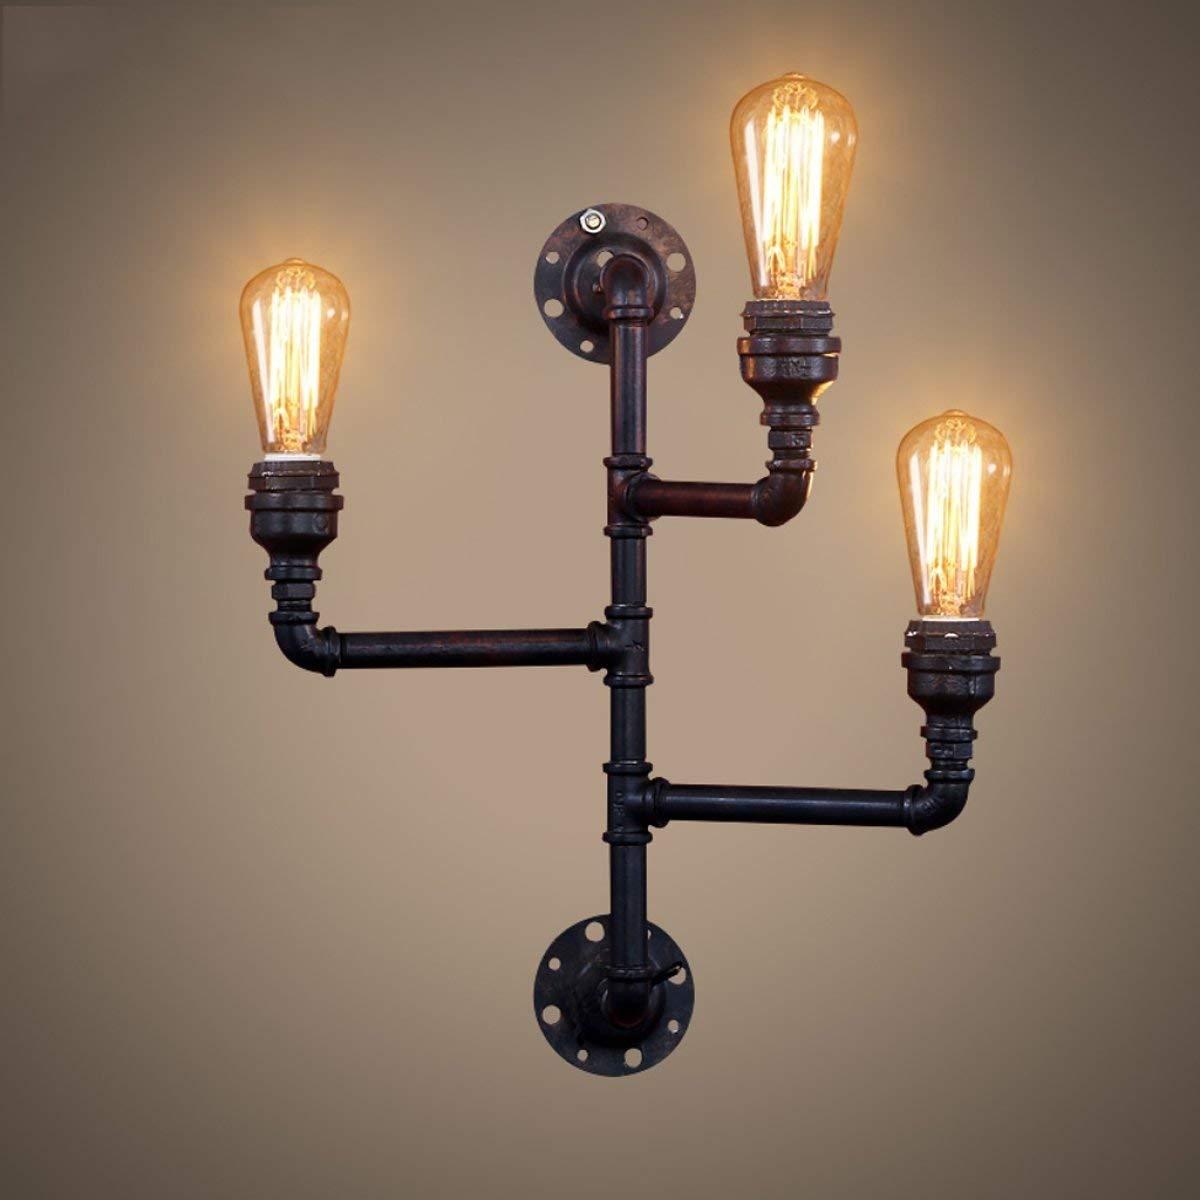 BXJ アメリカのレトロな壁ランプ鉄の壁ランプ水道管の壁ランプE27光源 B07R4DSYWL